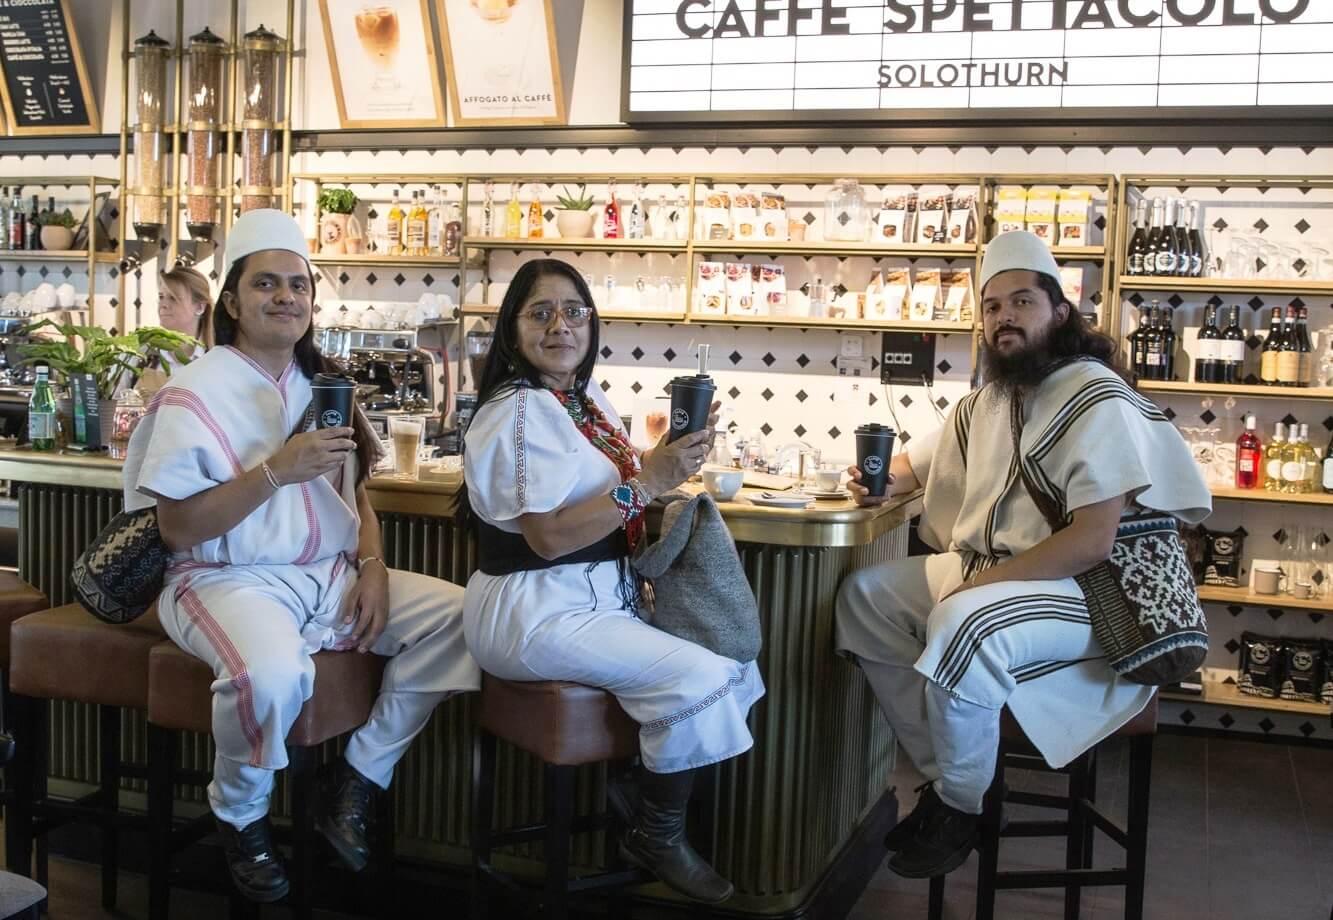 Vertreter der ANEI im Caffè Spettacolo Solothurn quer